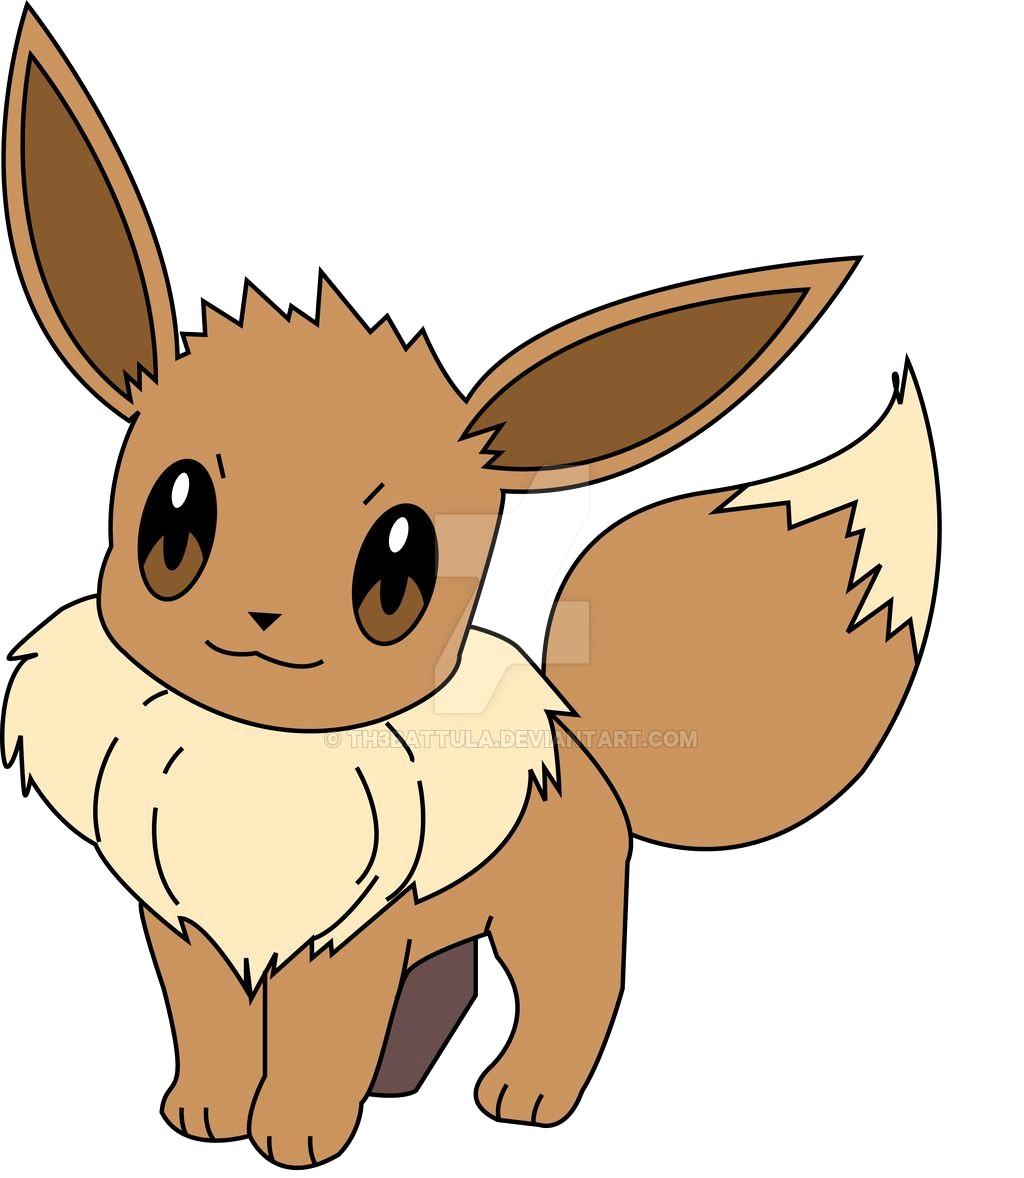 1024x1178 Practice Pokemon Vector 2 Eevee By Th3battula